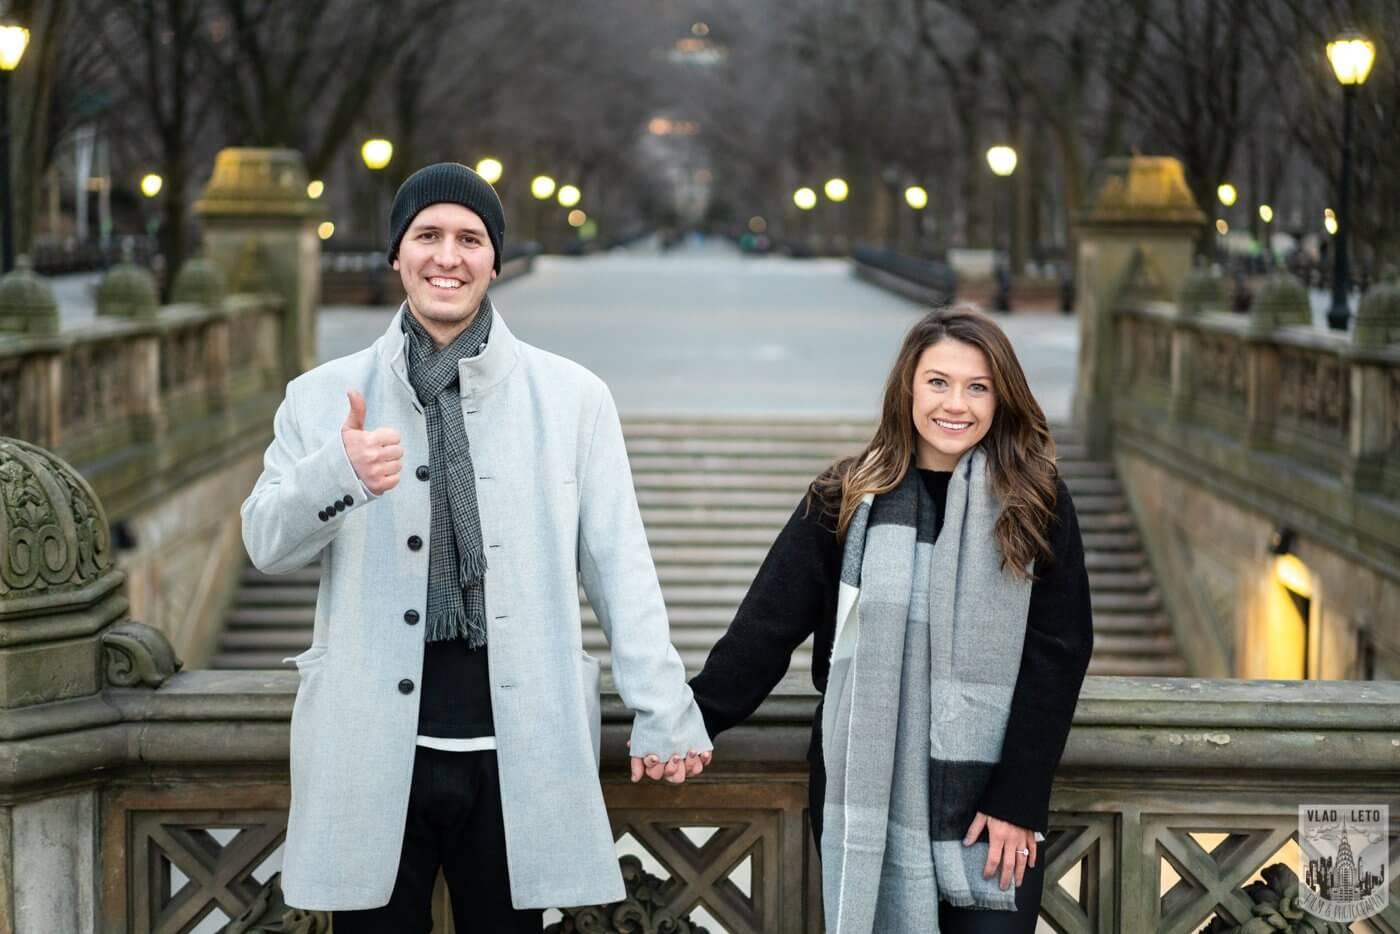 Photo 4 Bow bridge surprise marriage proposal.   VladLeto